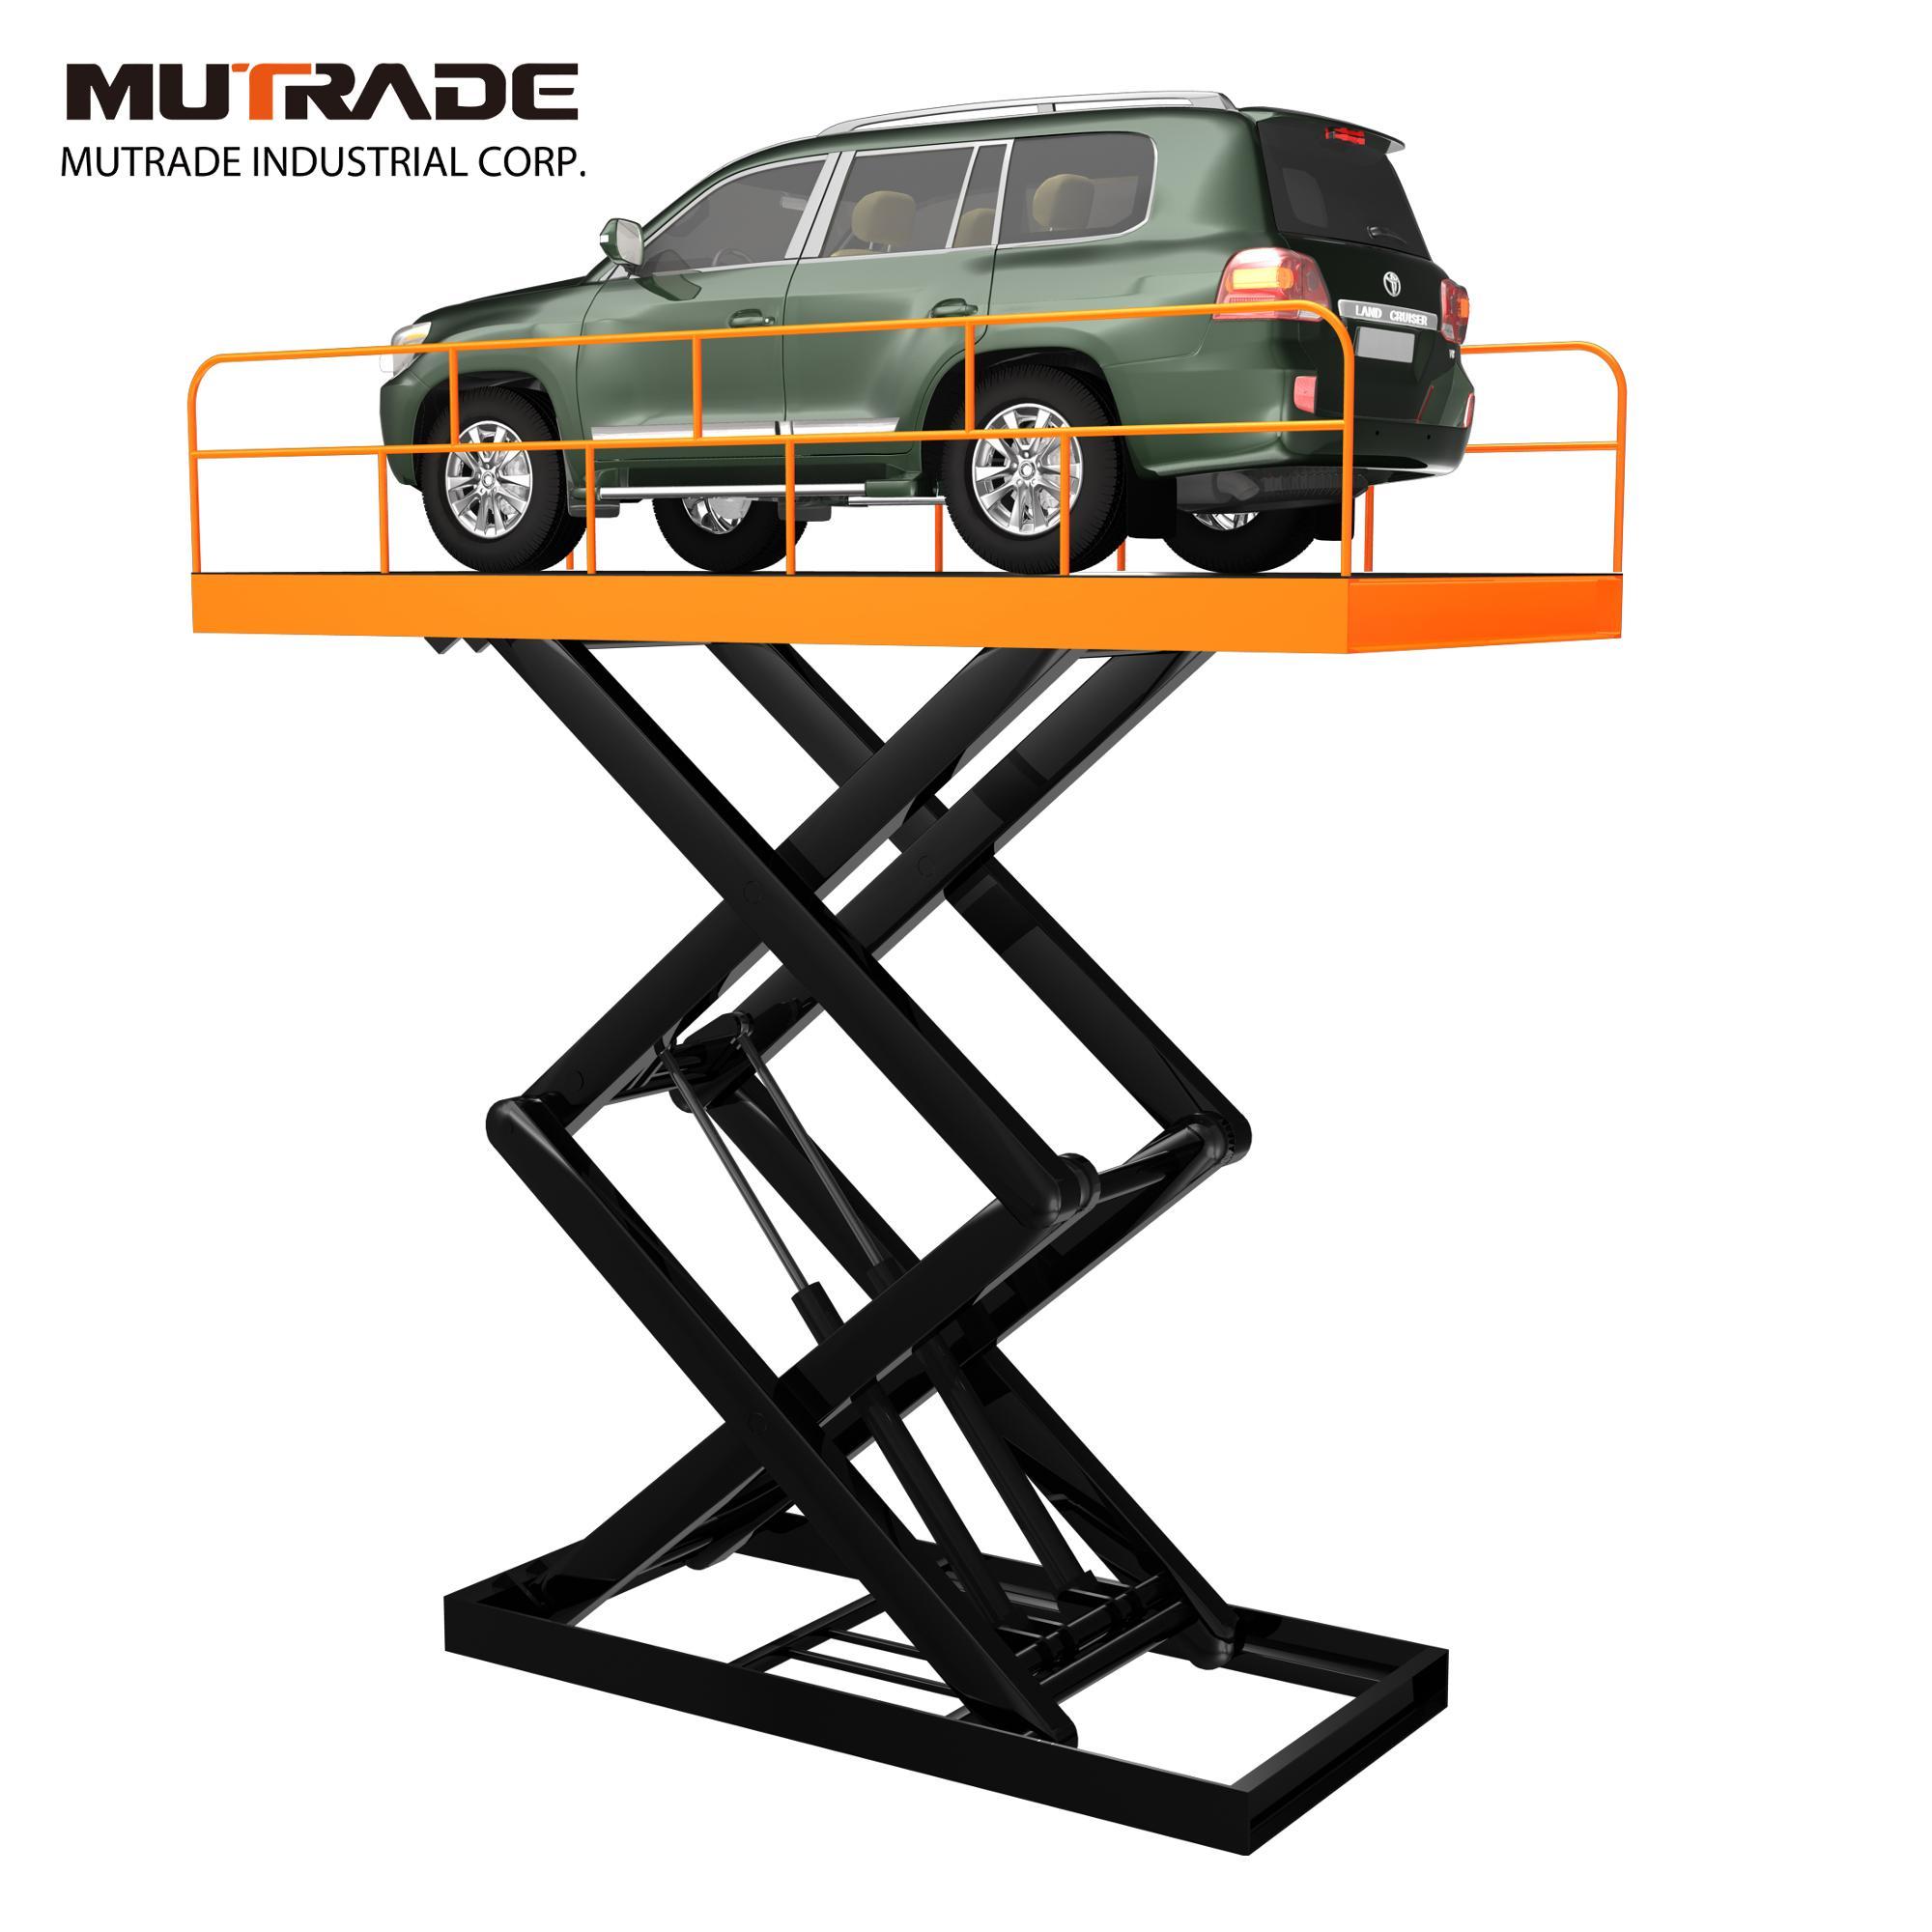 Portable Car Hydraulic Scissor Lift - Buy Scissor Lift,Mini Scissor Car  Lift,Mobile Scissor Car Lift Product on Alibaba com